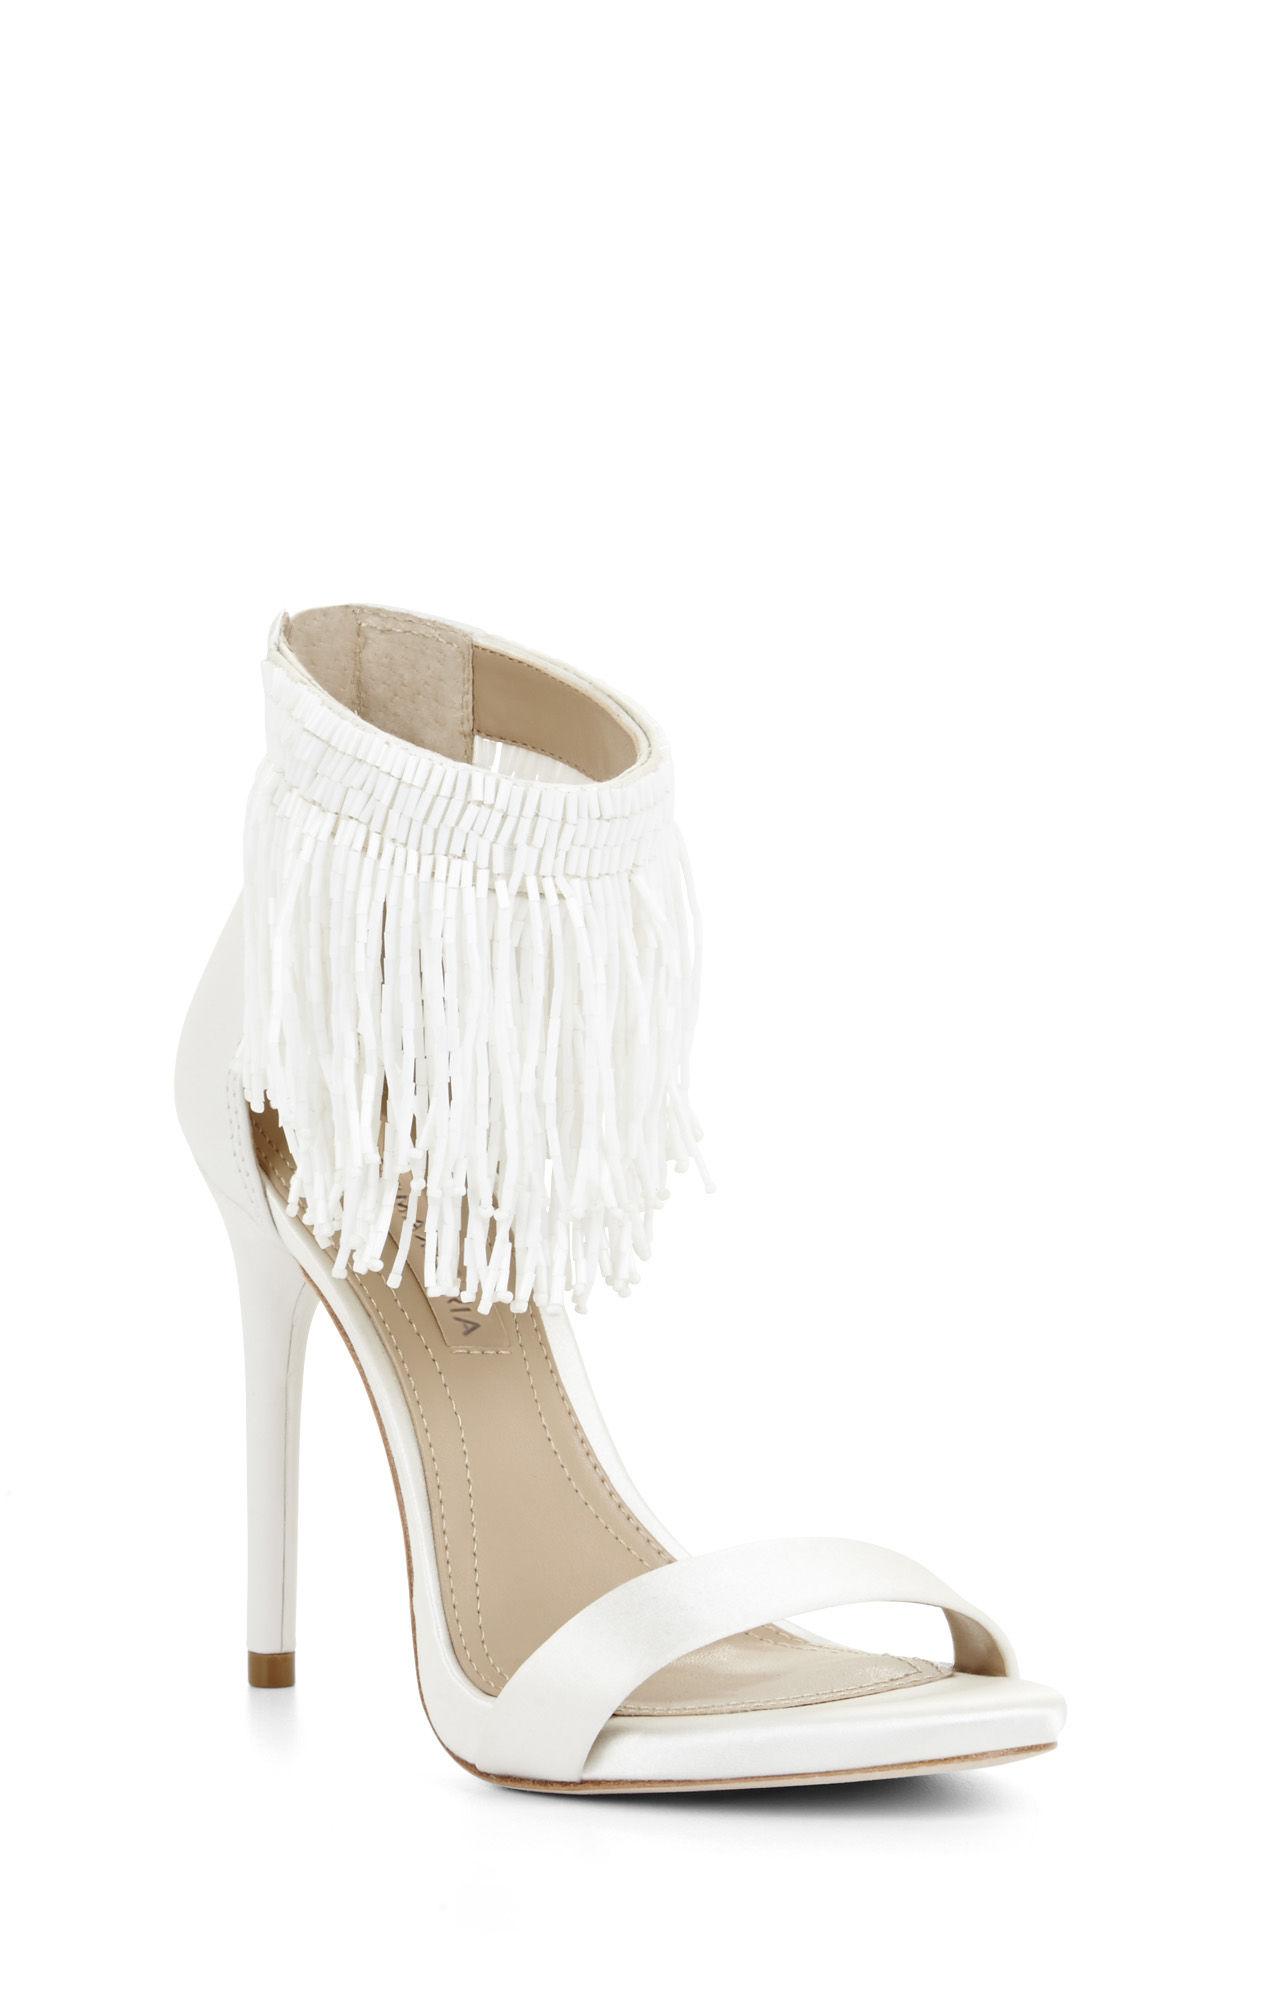 ffaf52126a51 Bcbgmaxazria Devine High-heel Beaded Ankle Dress Sandal in White - Lyst